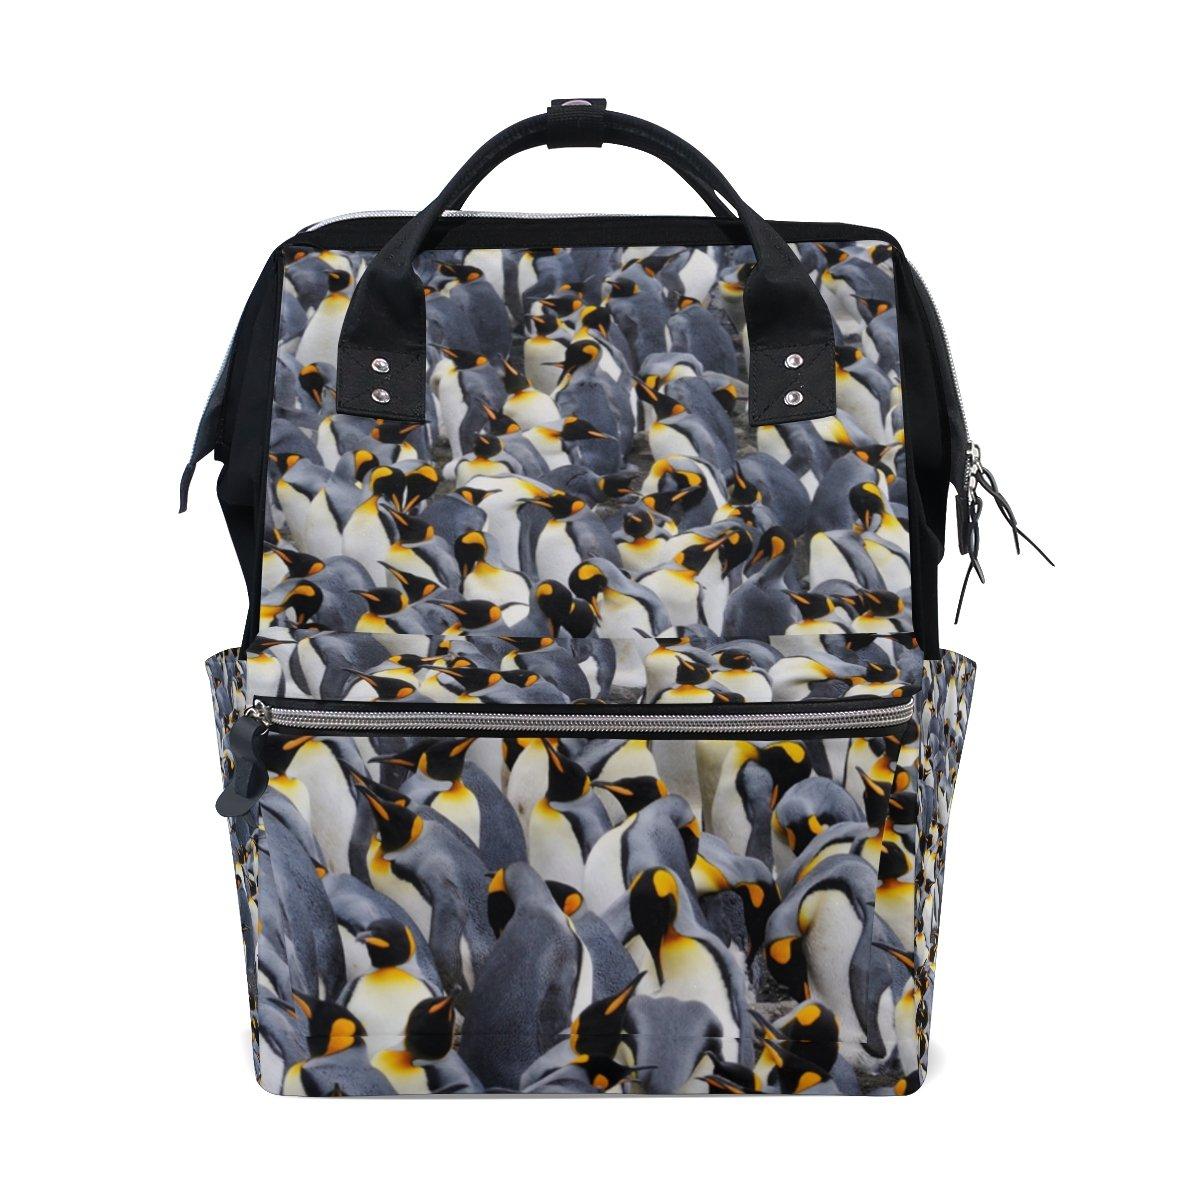 ALAZA King Penguin School Backpack Mummy Nappy Travel Nurse Bag Tote Bag